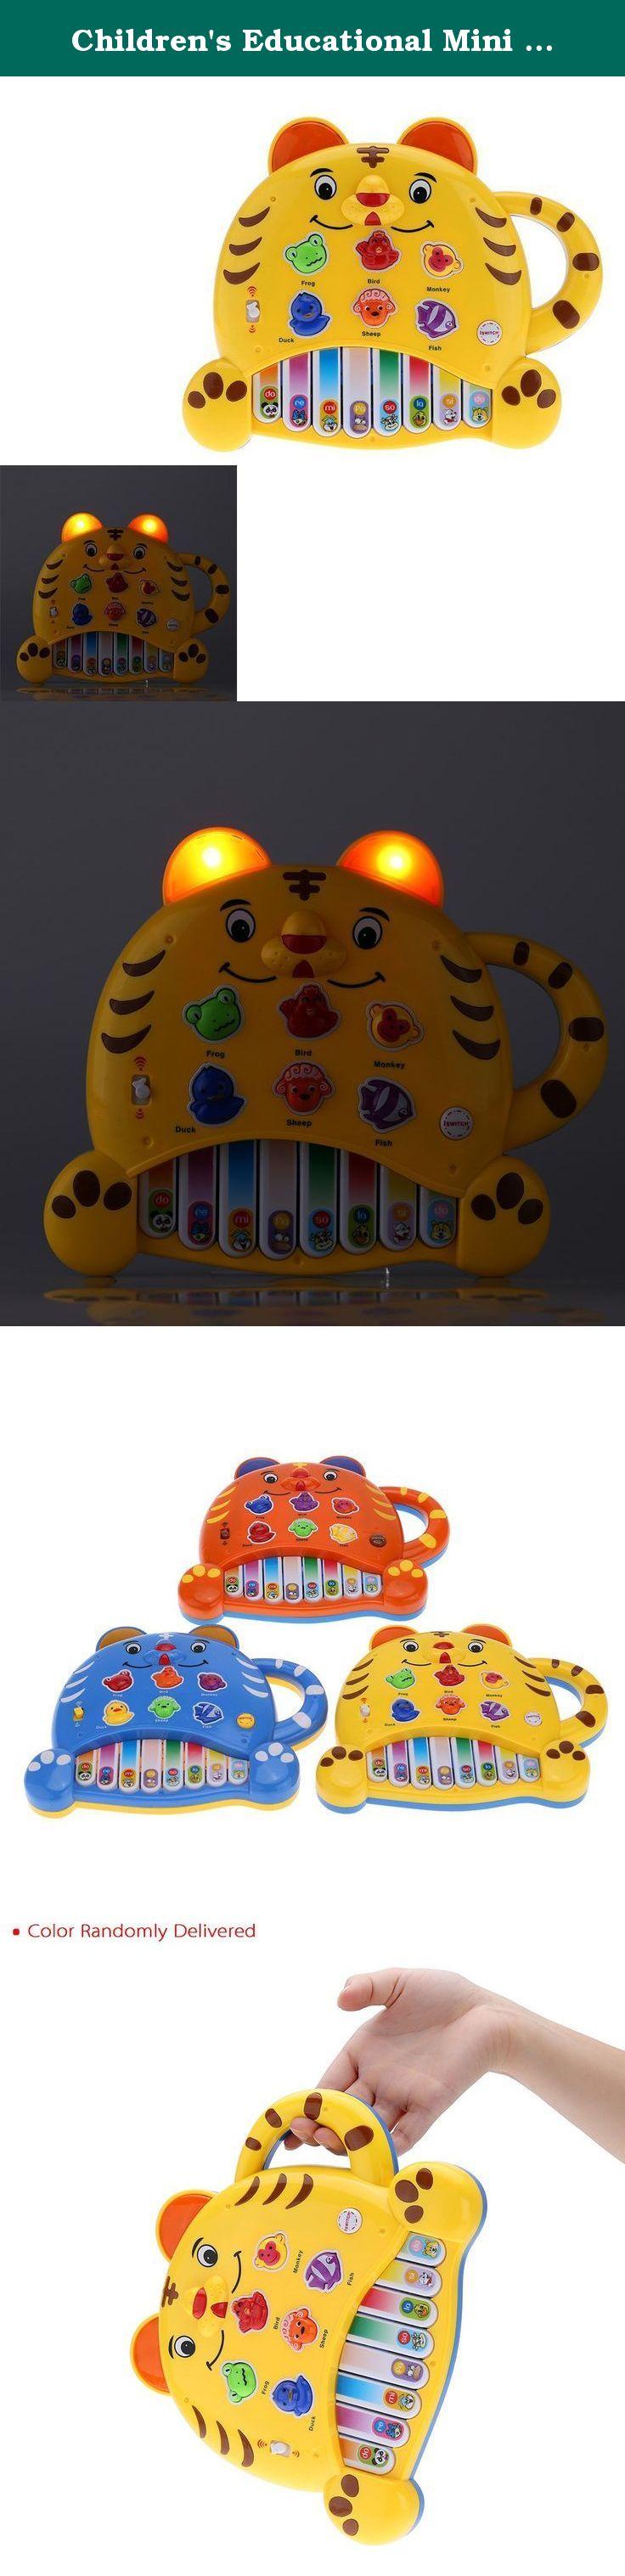 Baby toys images cartoon  Childrenus Educational Mini Piano Children Gift Baby Electone Music